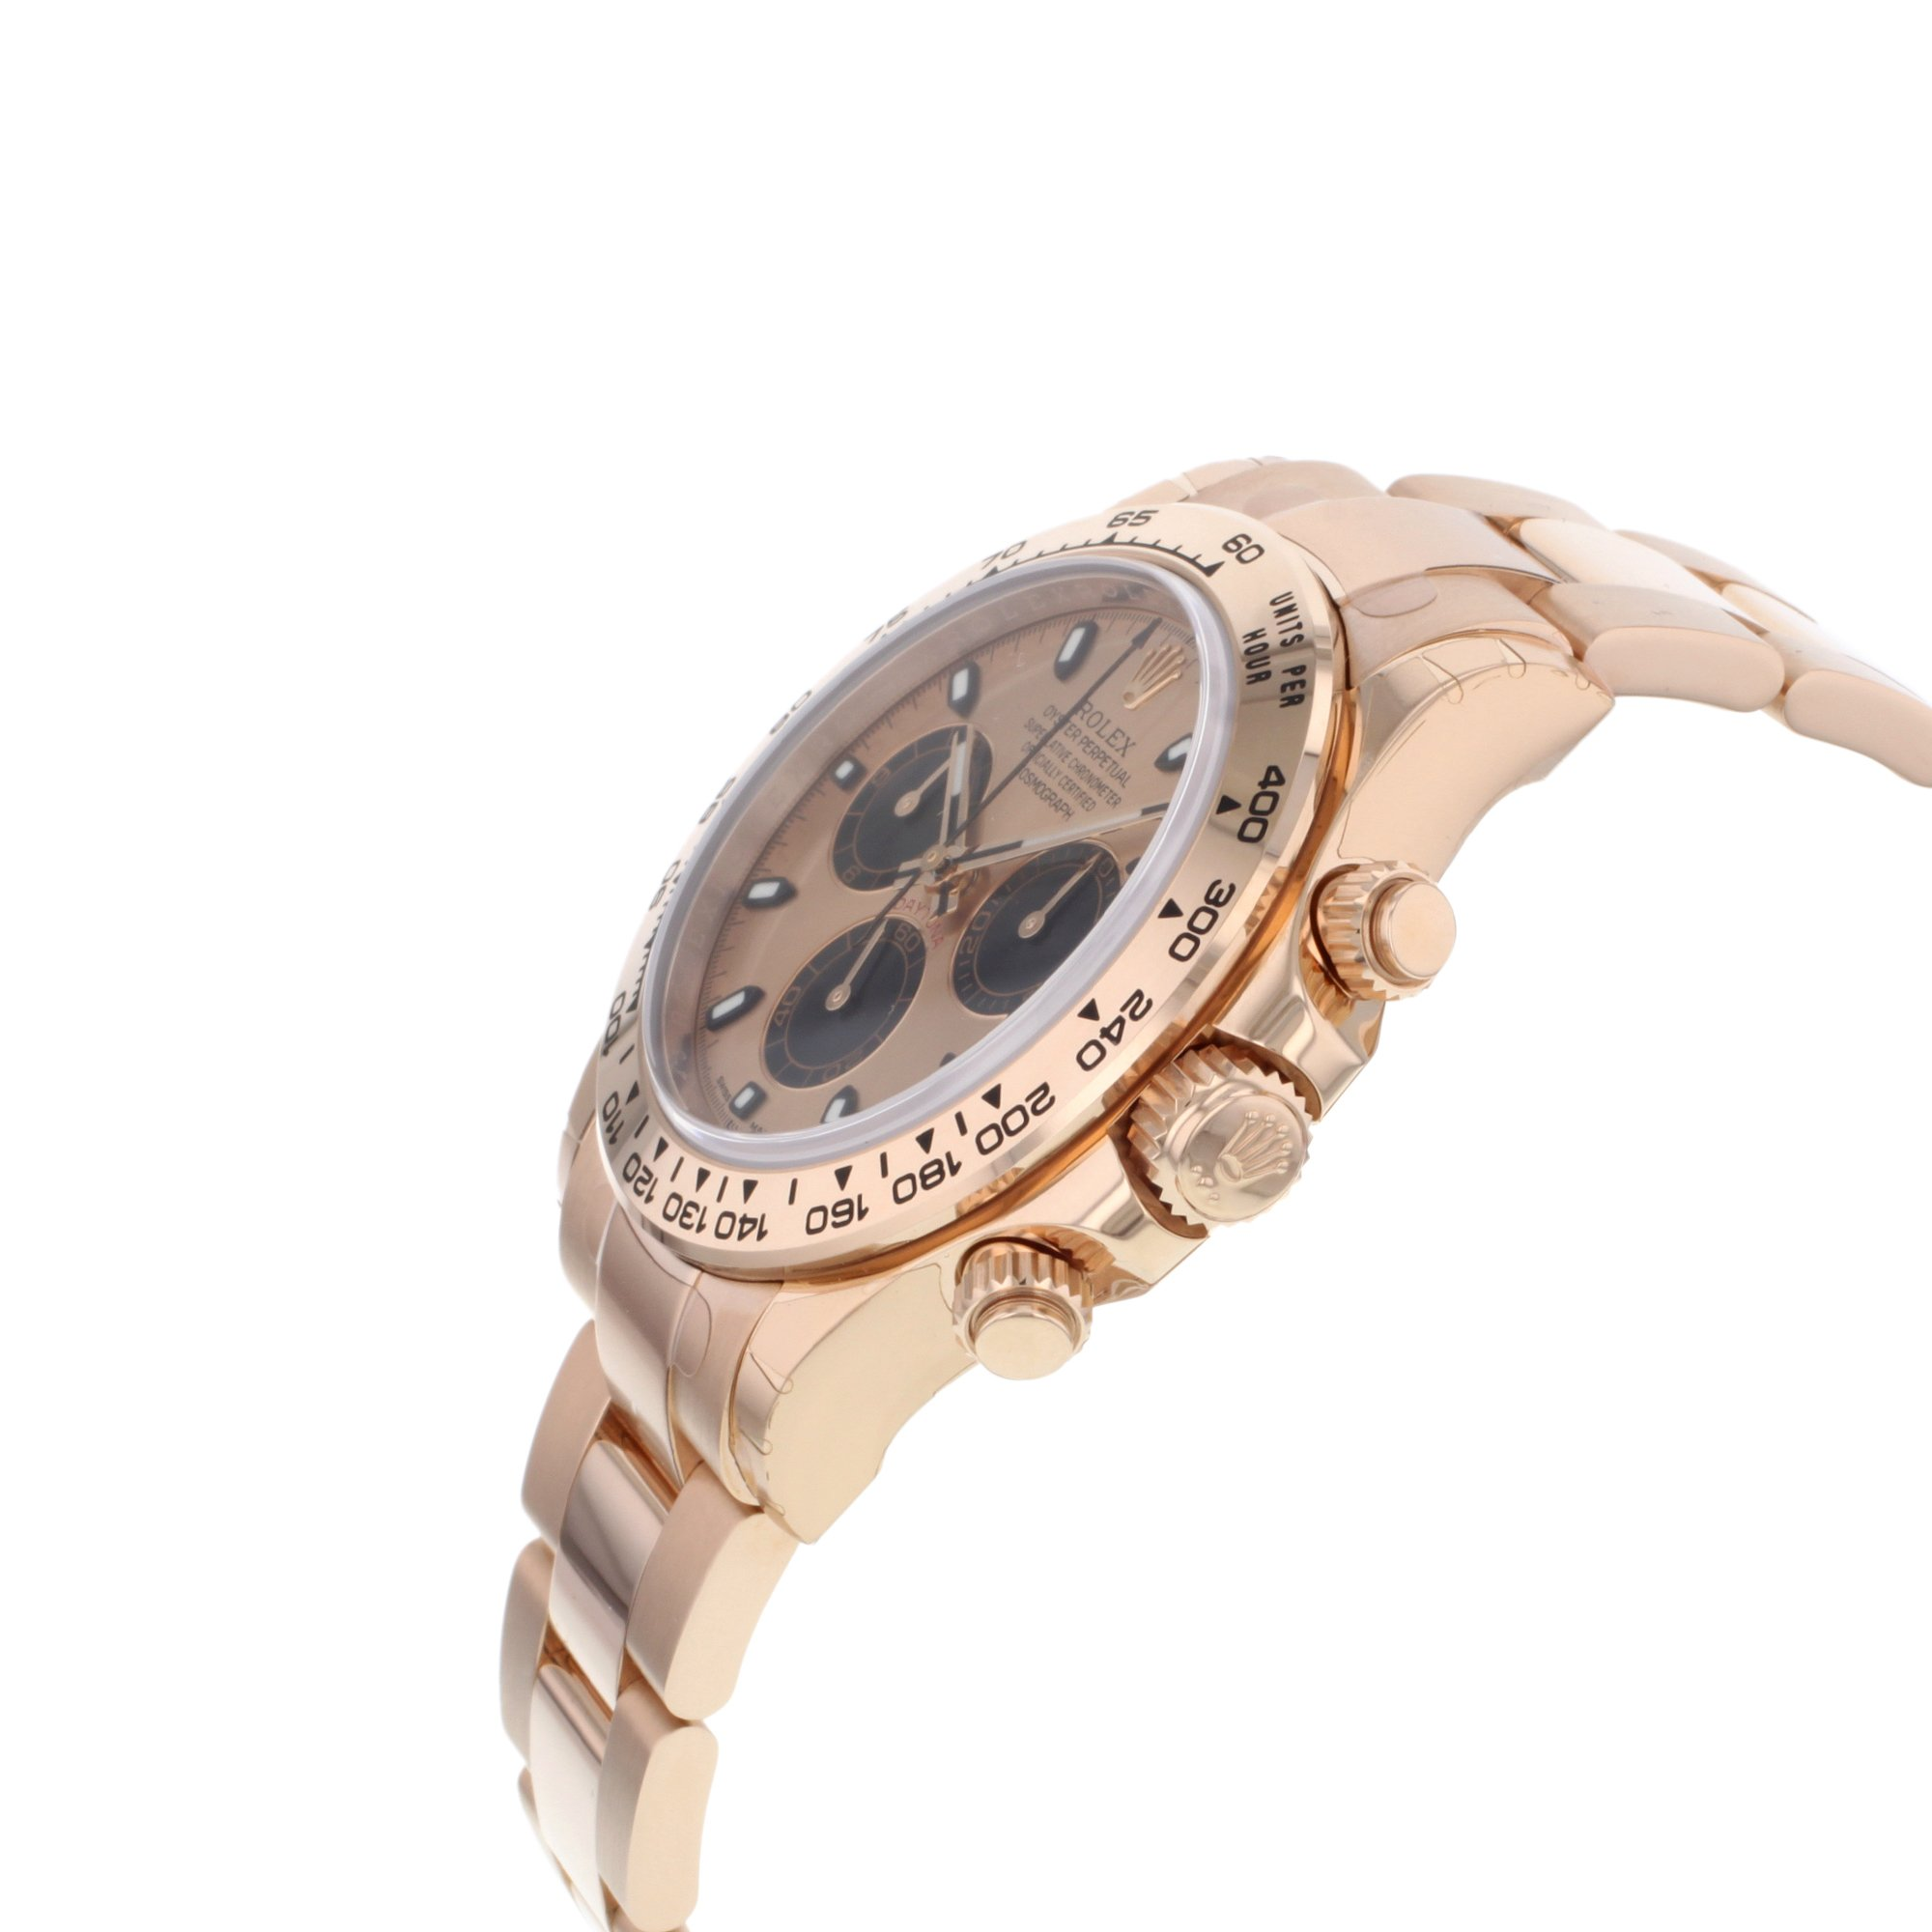 B00ZJGE1RI B00ZJGE1RI Rolex Daytona 116505 pbk 18K Everose Automatic Men's Watch